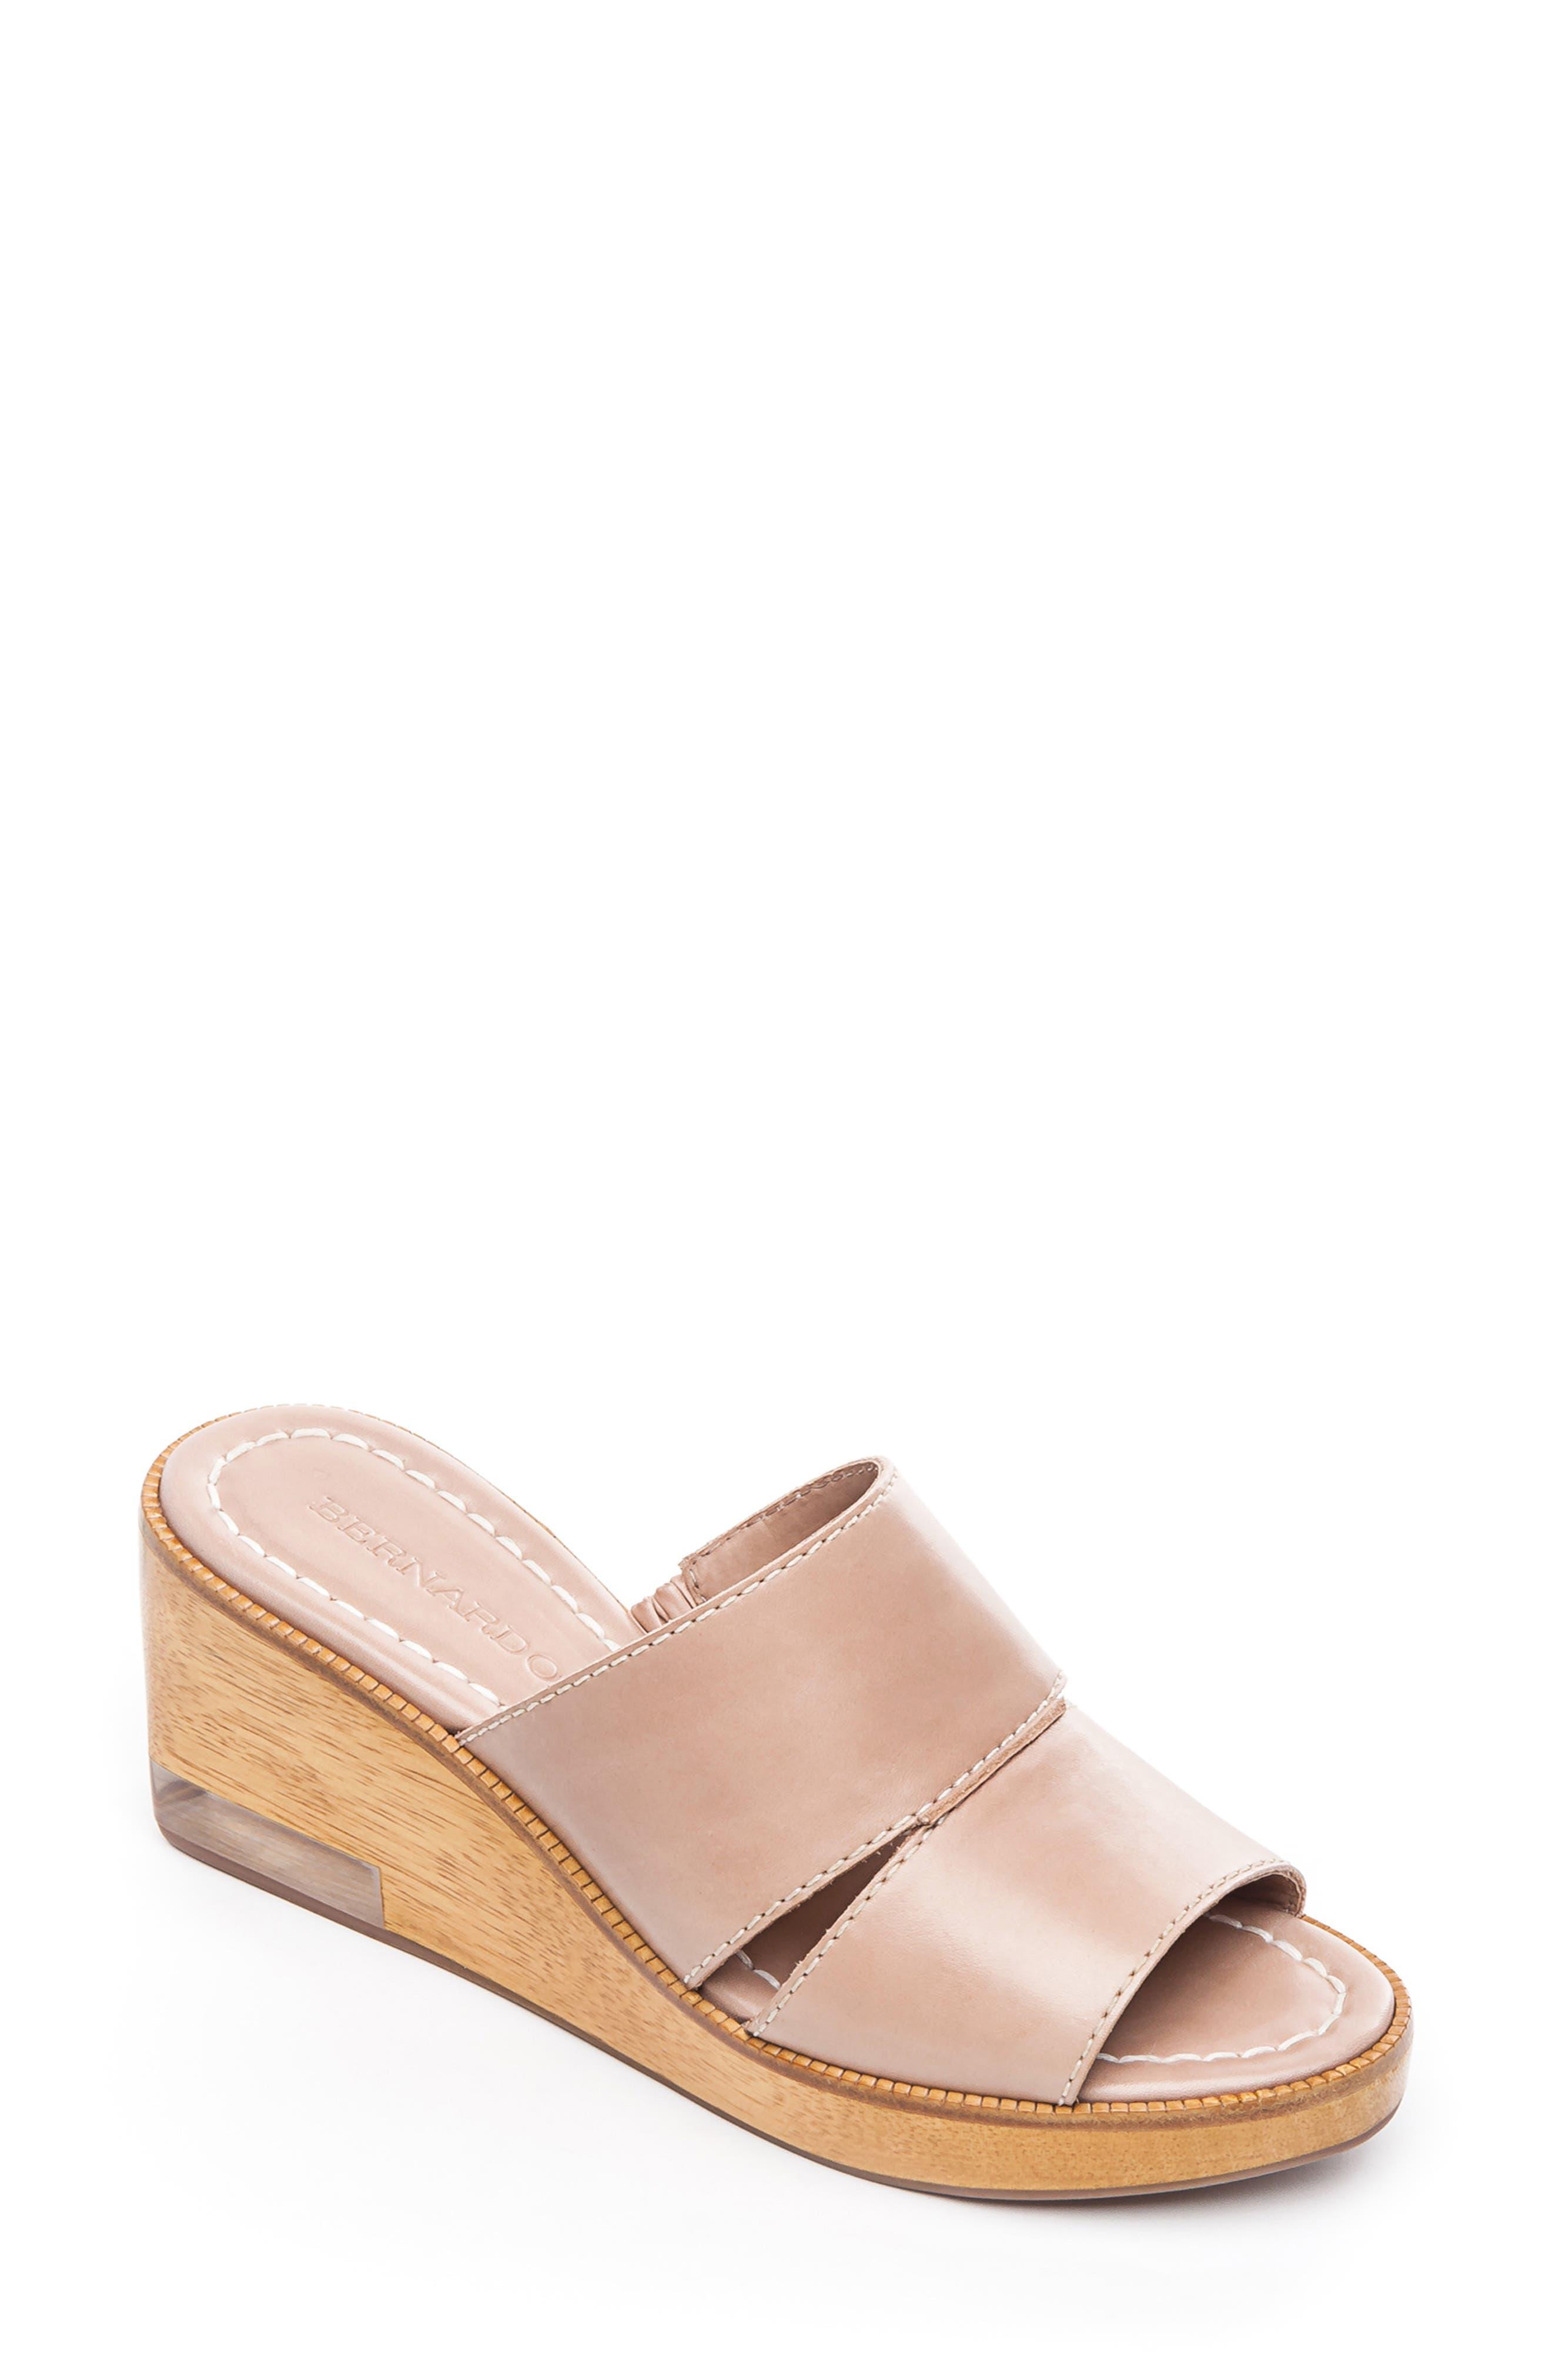 Bernardo Kara Wedge Sandal, Pink